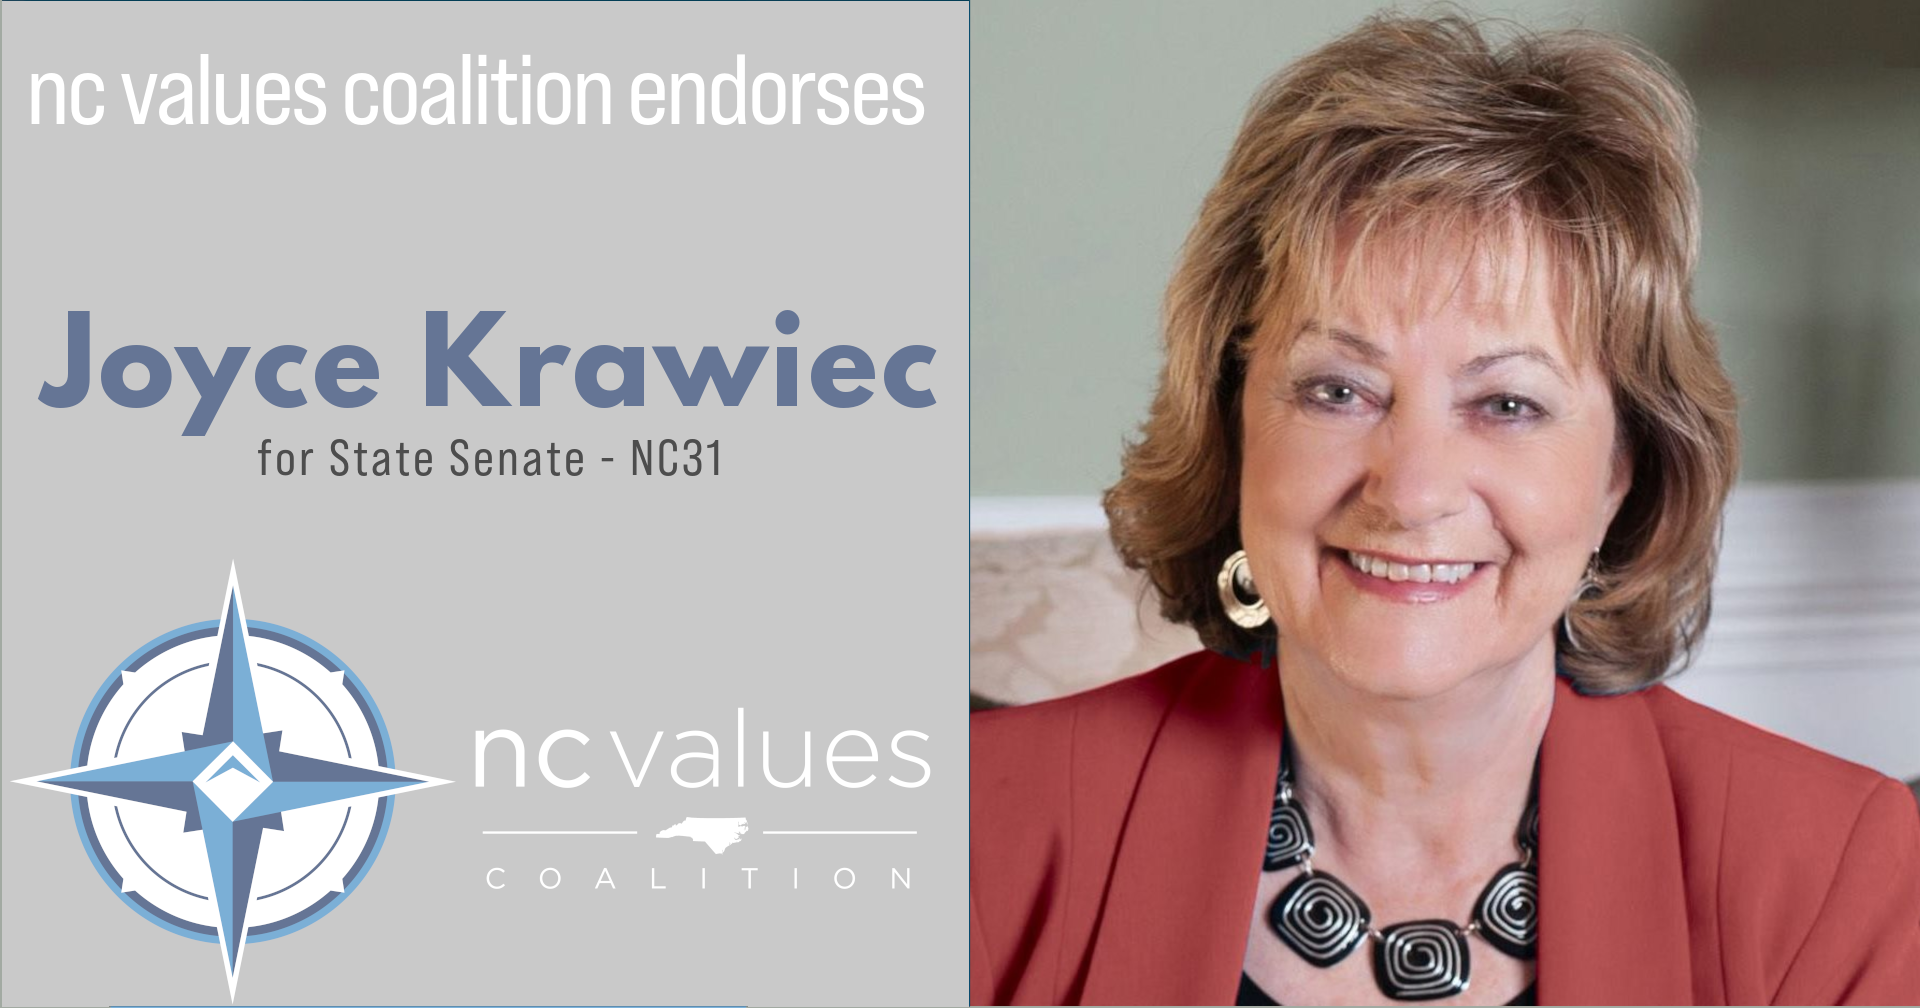 Joyce Krawiec NC State Senate NC31